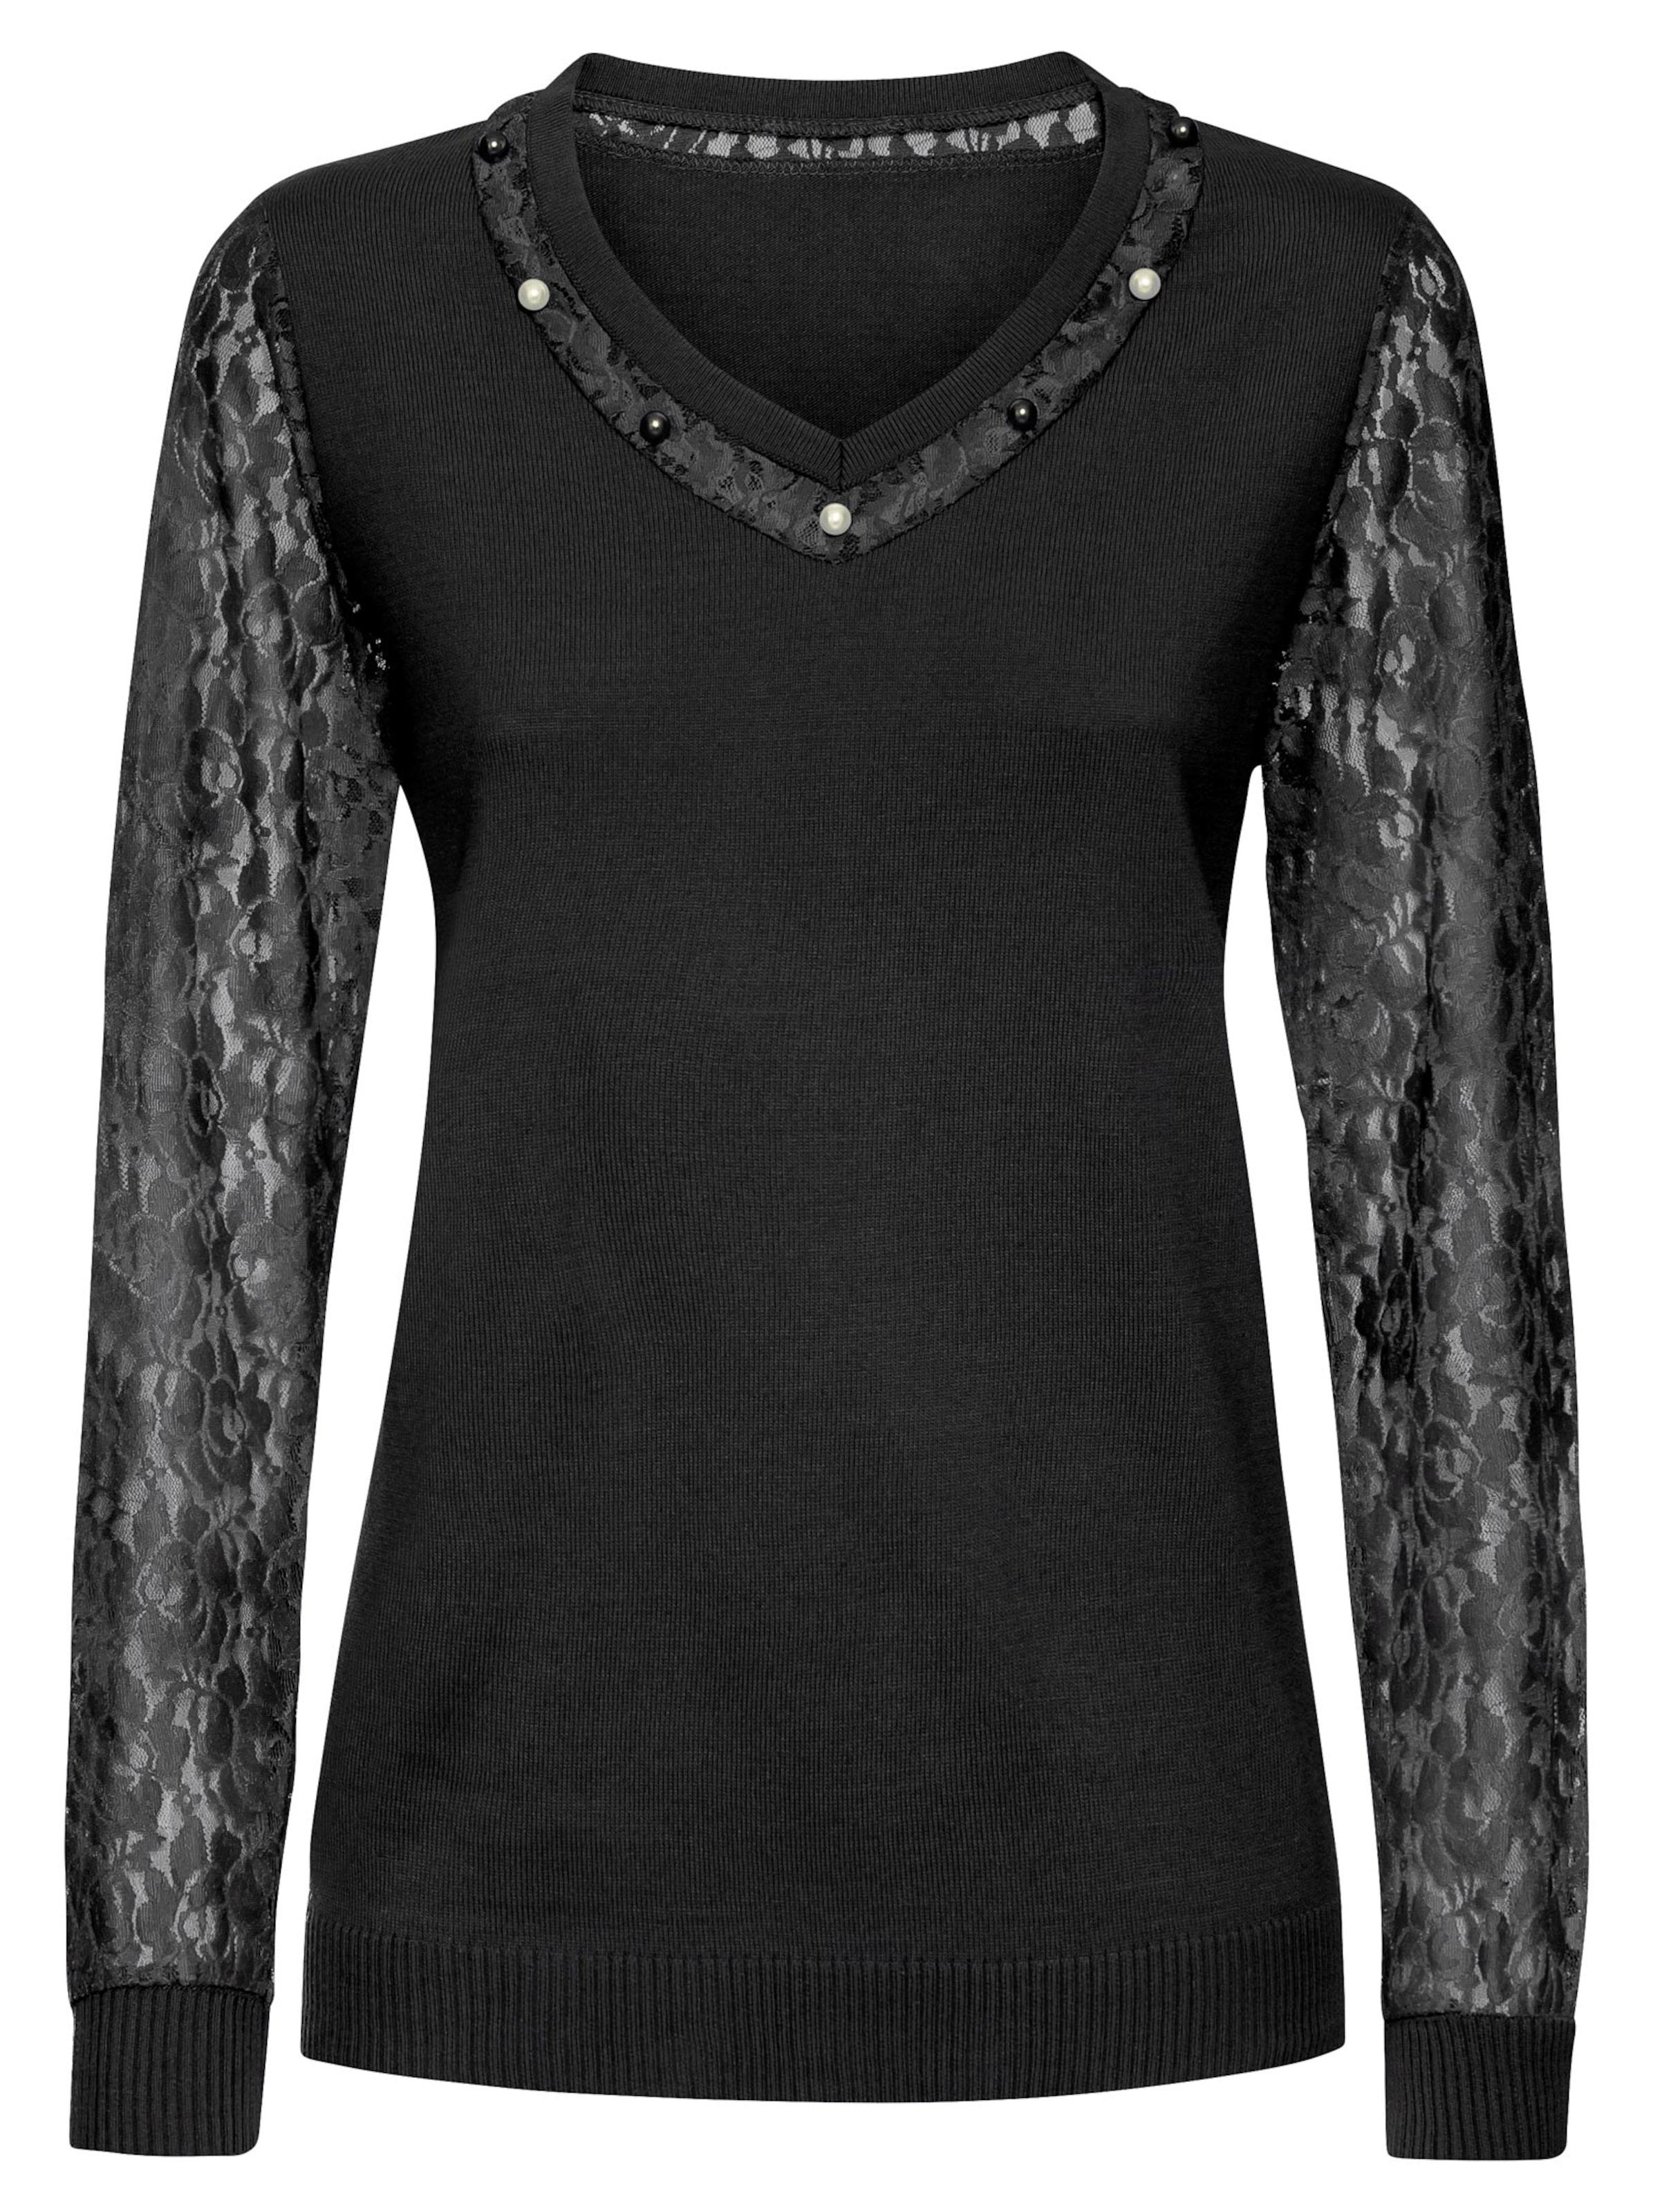 witt weiden -  Damen Spitzen-Pullover schwarz